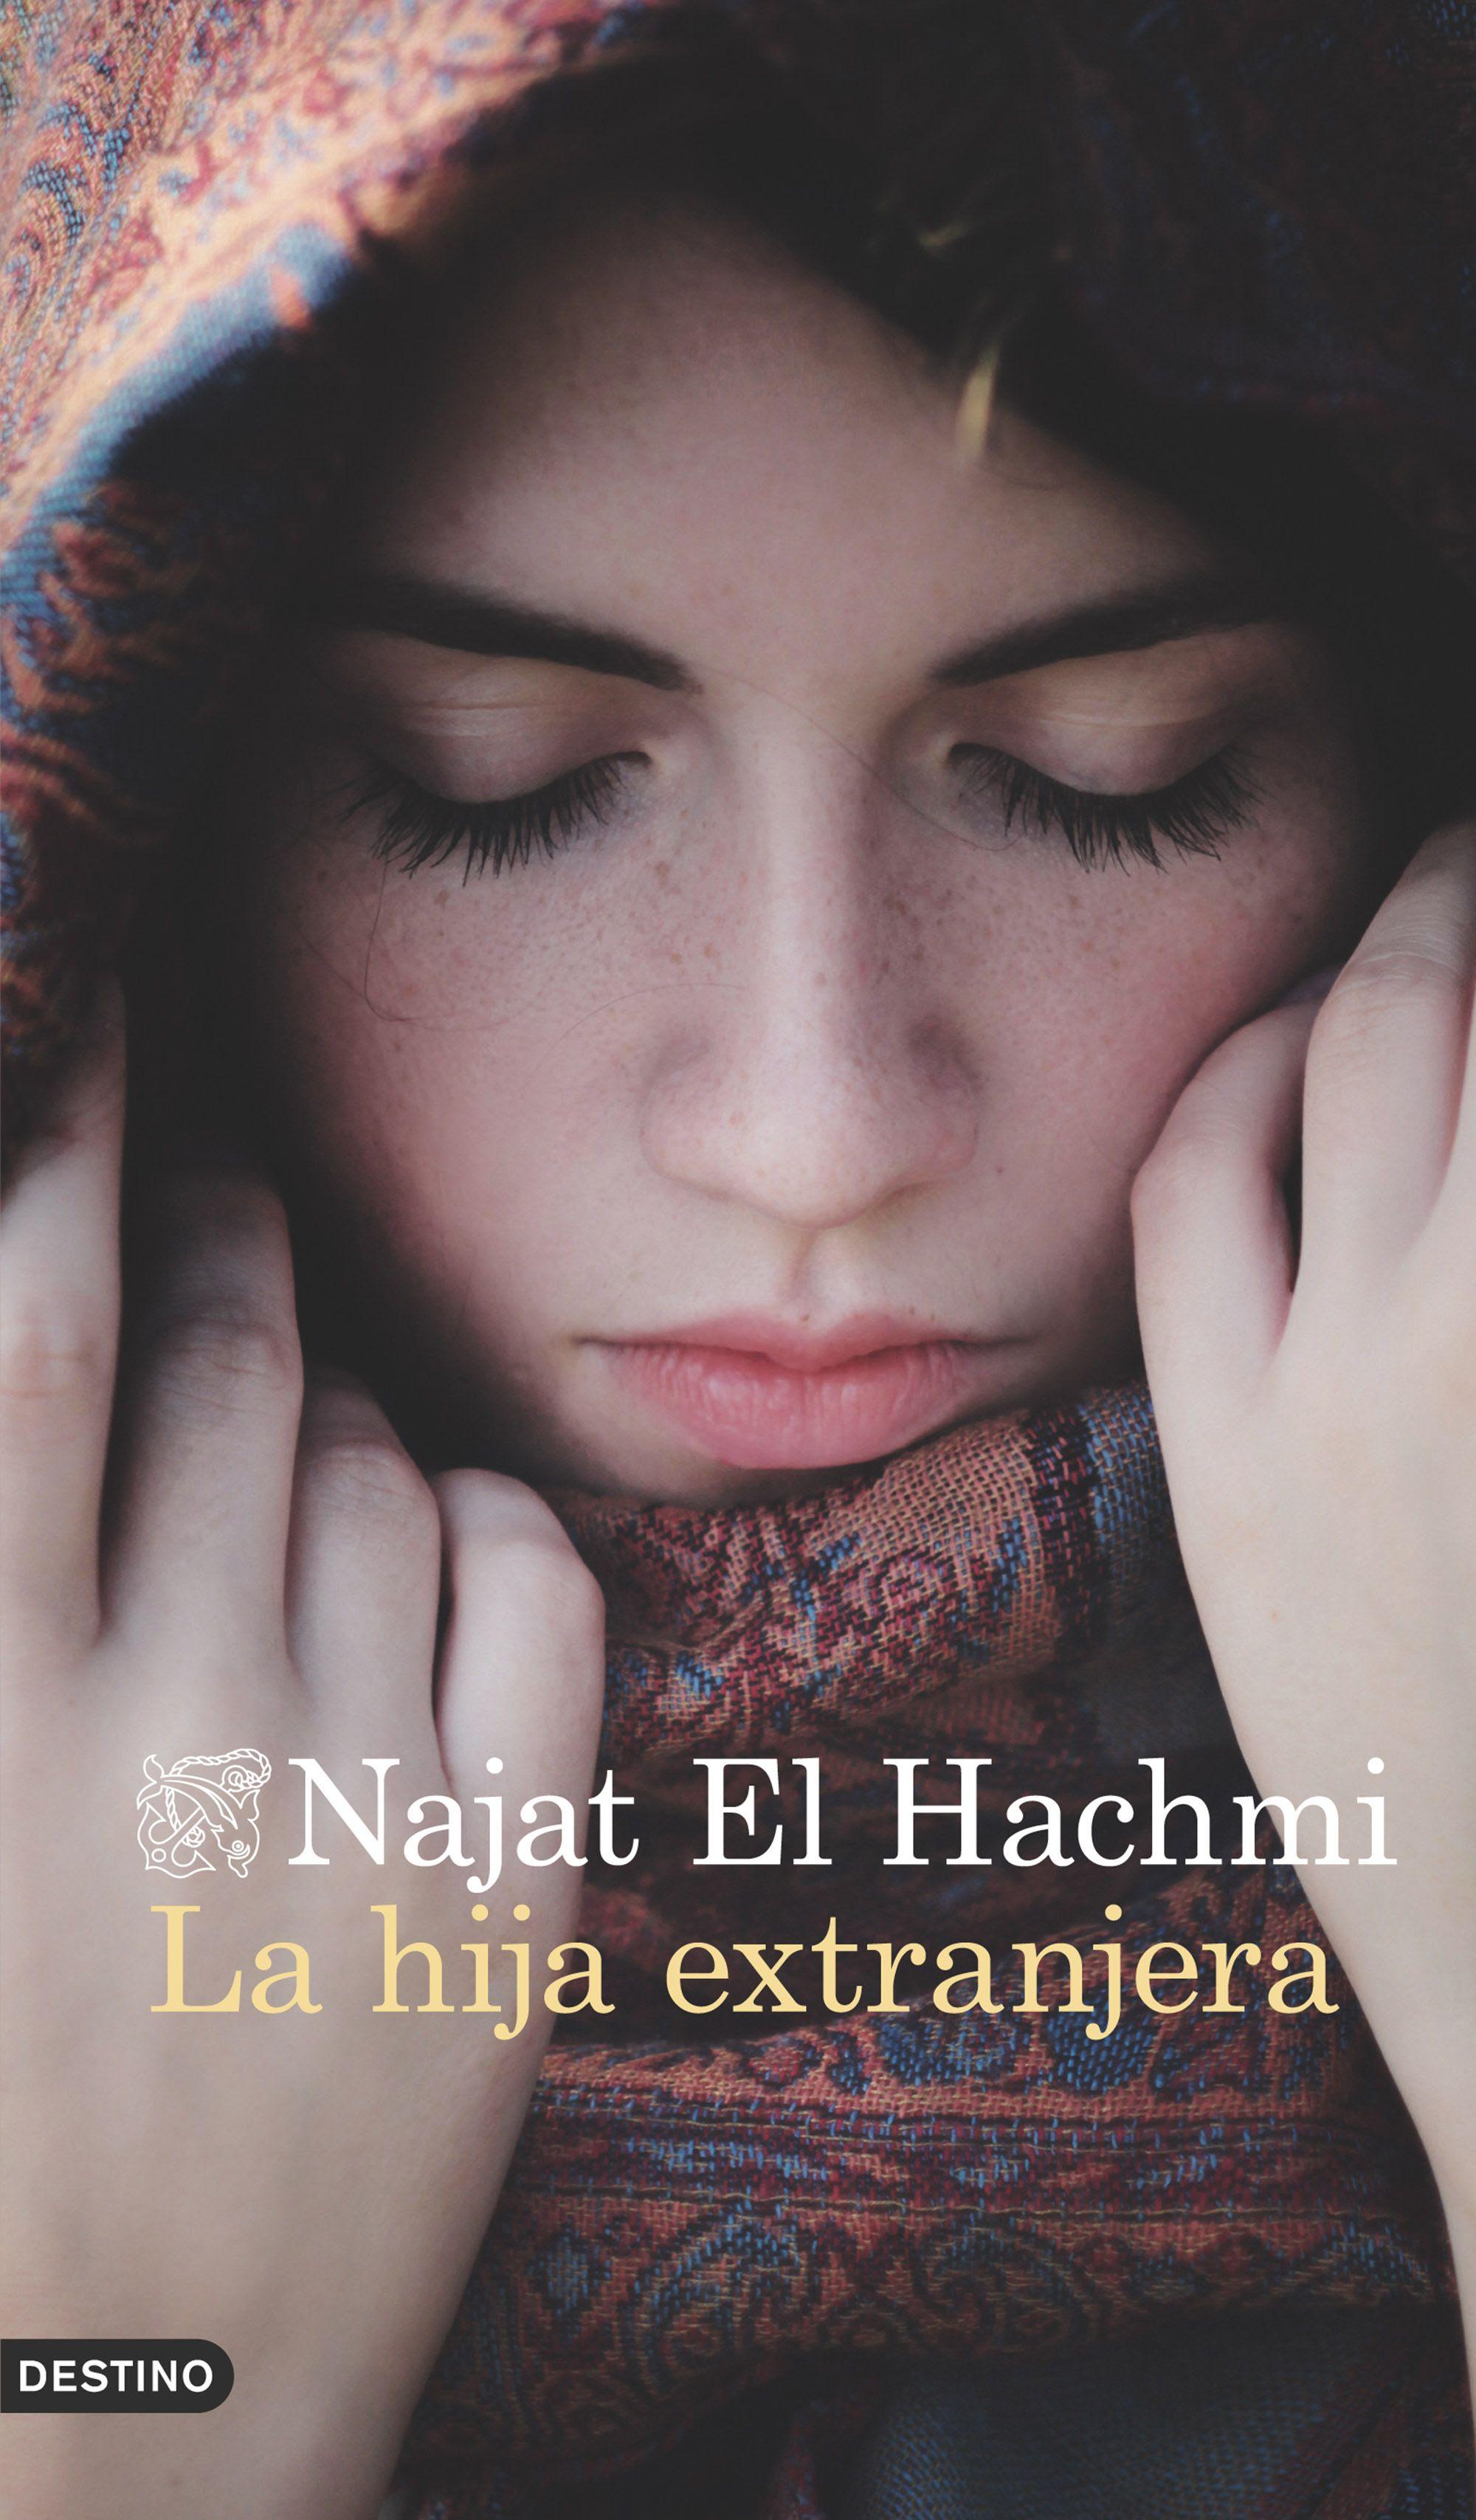 portada_la-hija-extranjera_najat-el-hachmi_201507241112